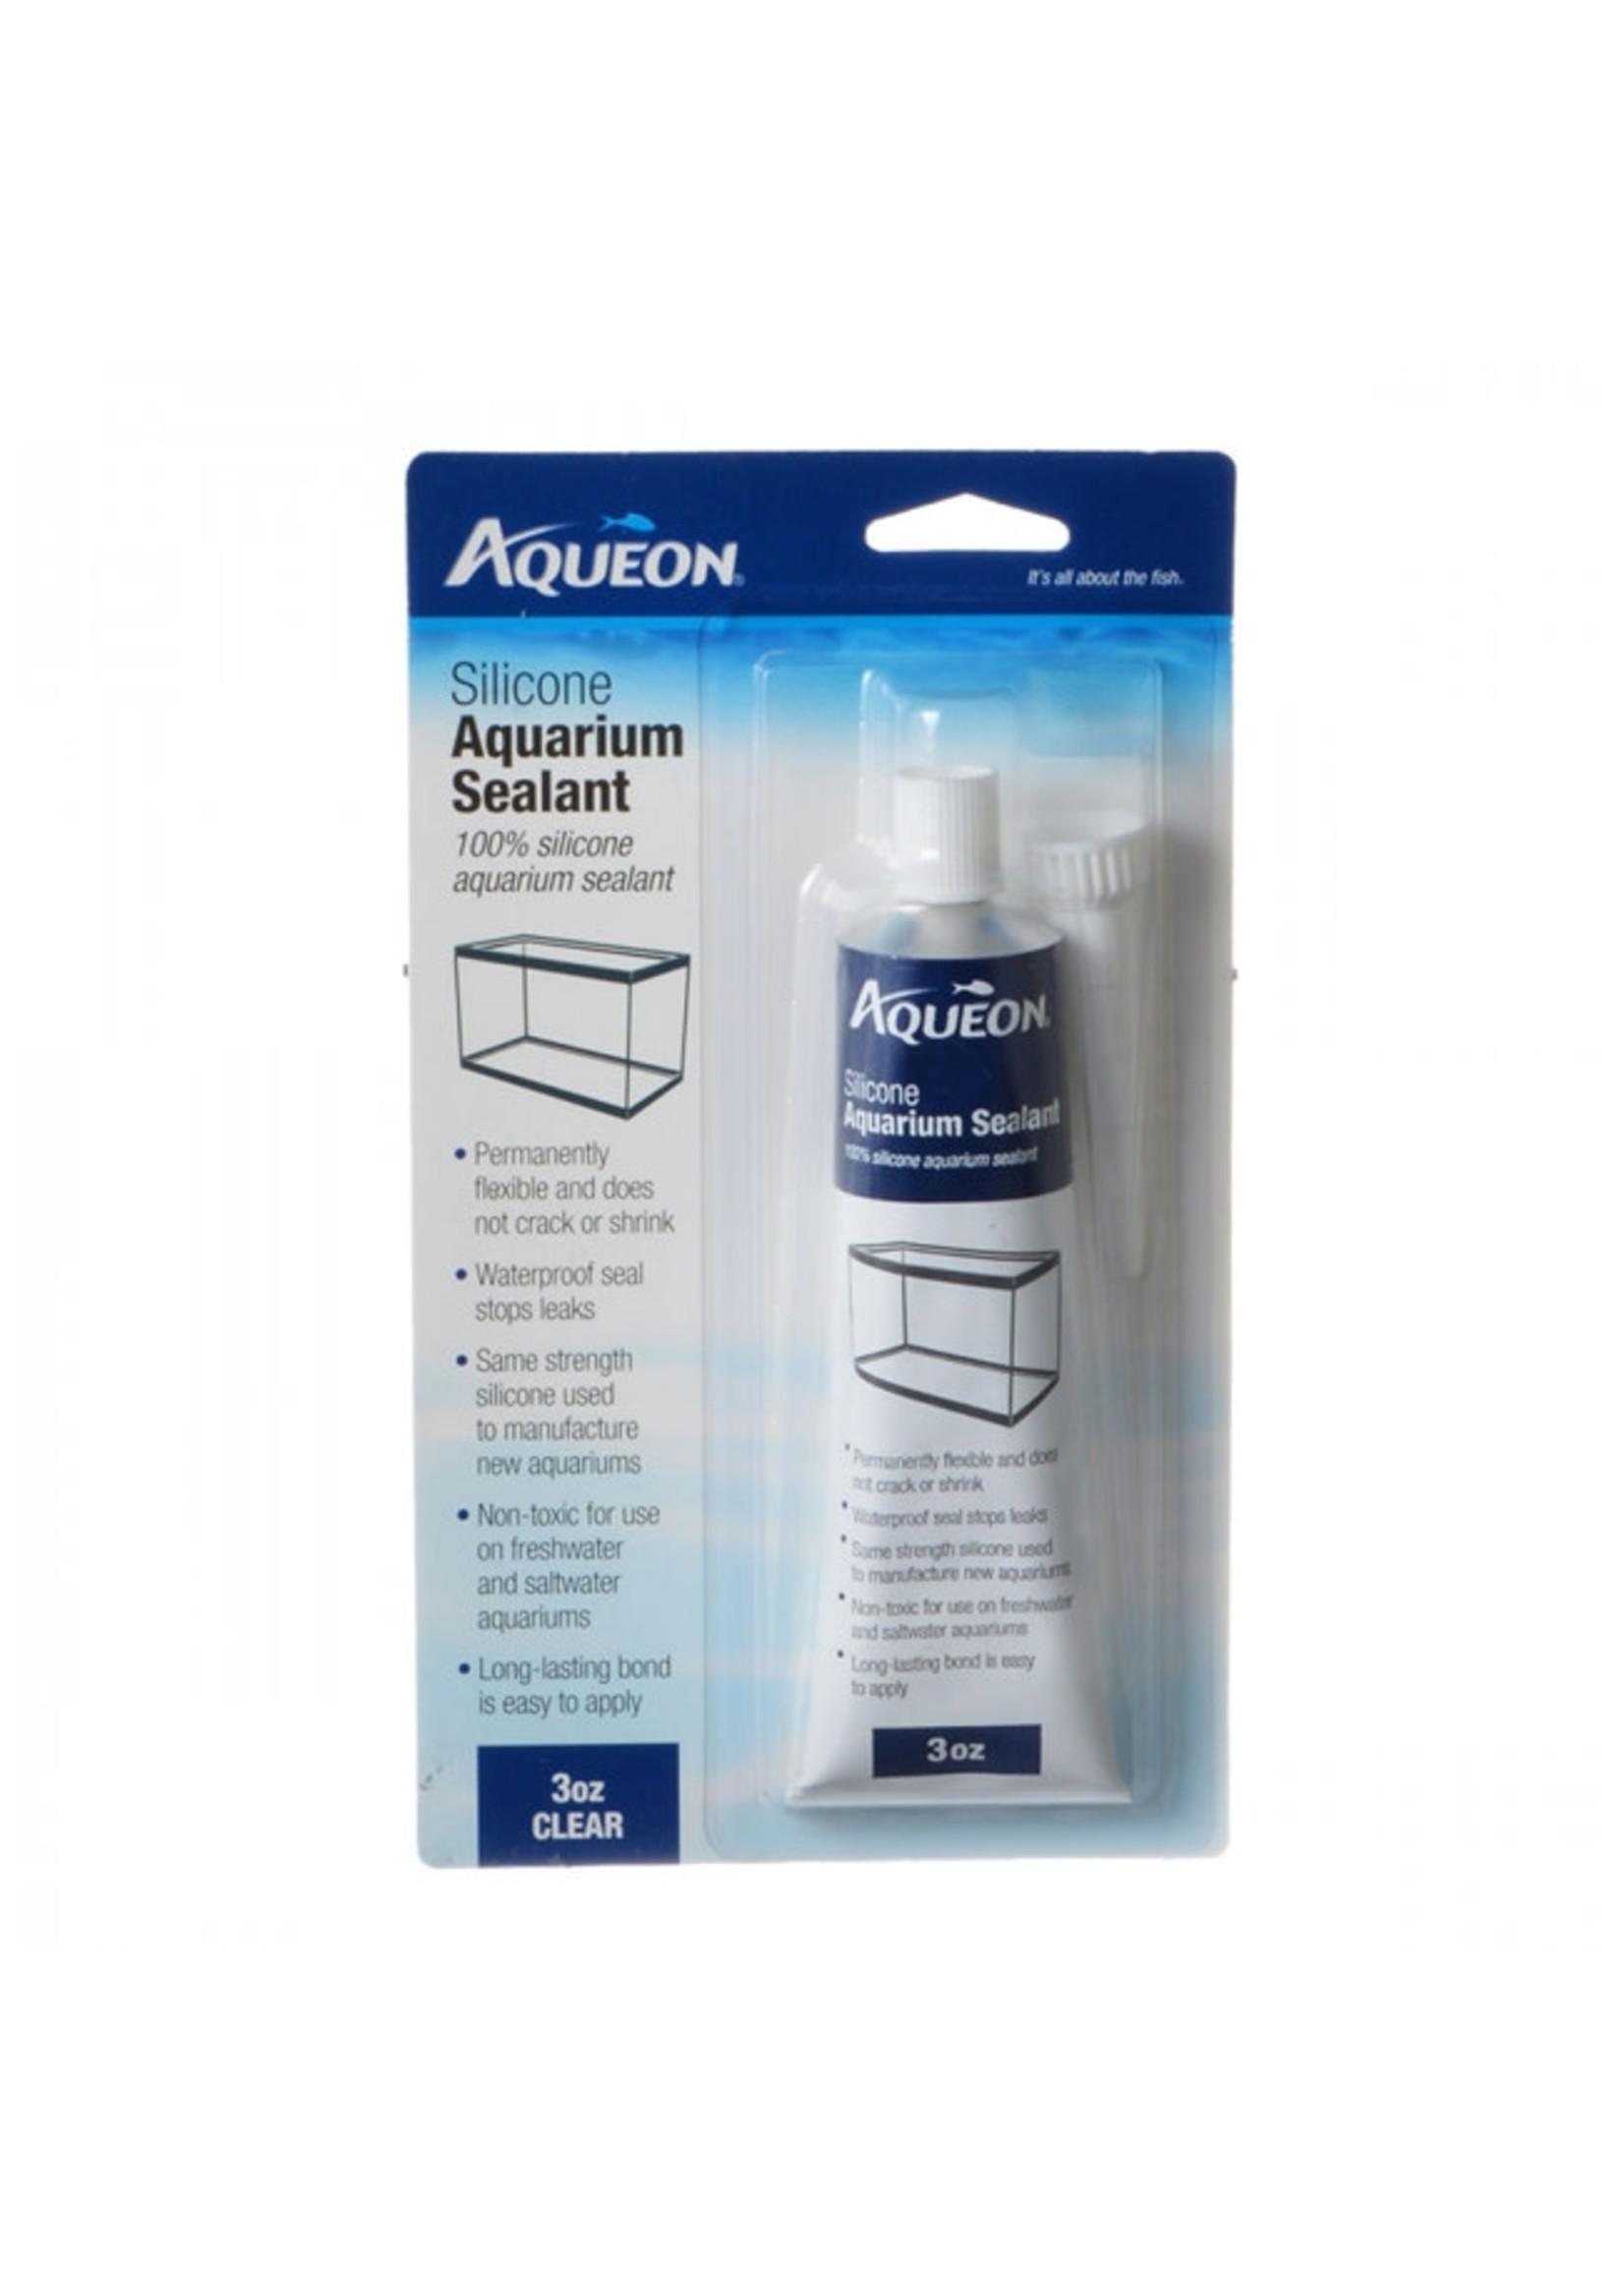 Aqueon Aqueon Silicone Aquarium Sealant